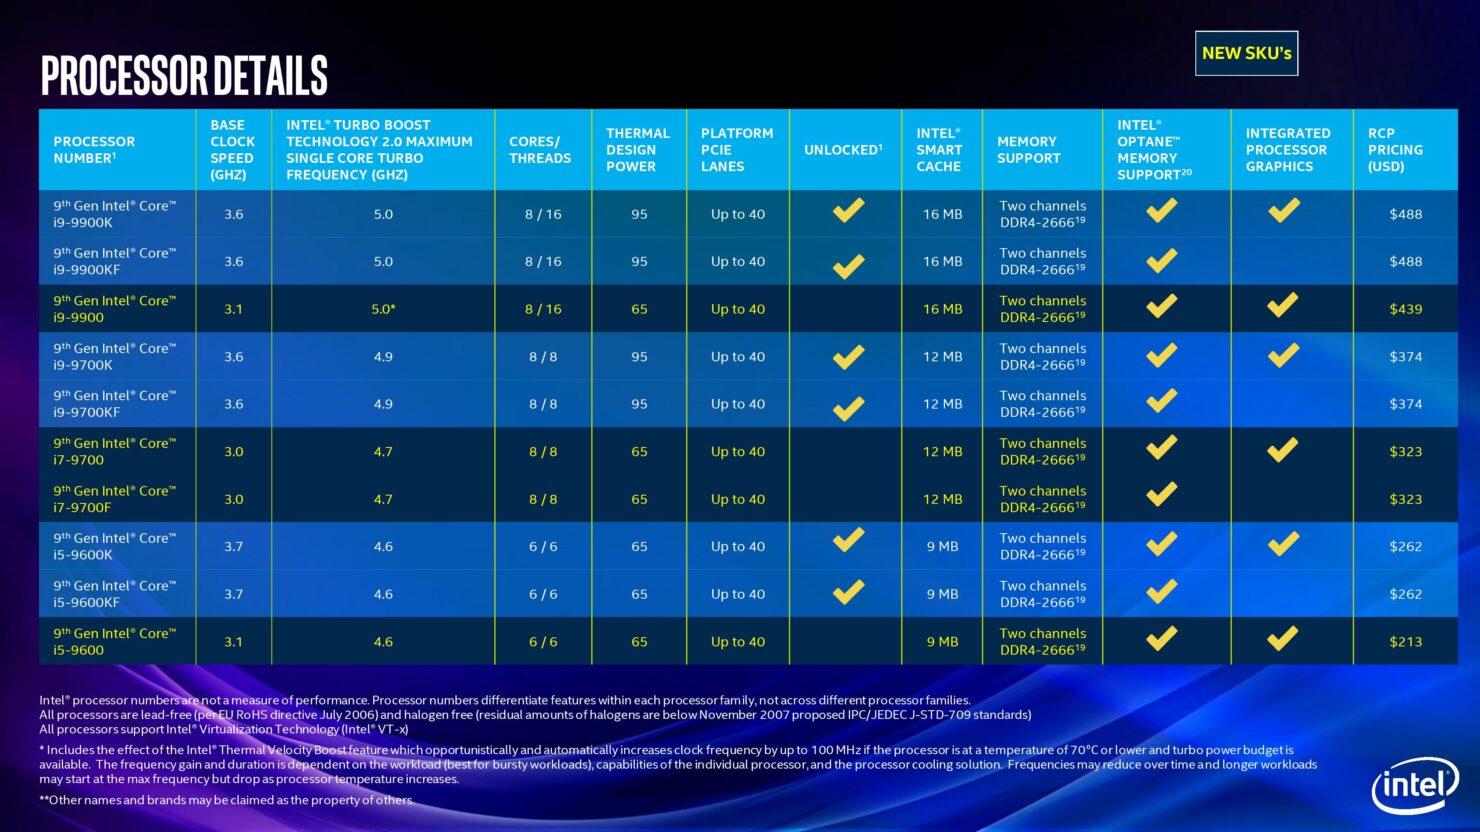 9th-gen-intel-core-mobile-launch-presentation-under-nda-until-april-23-page-022